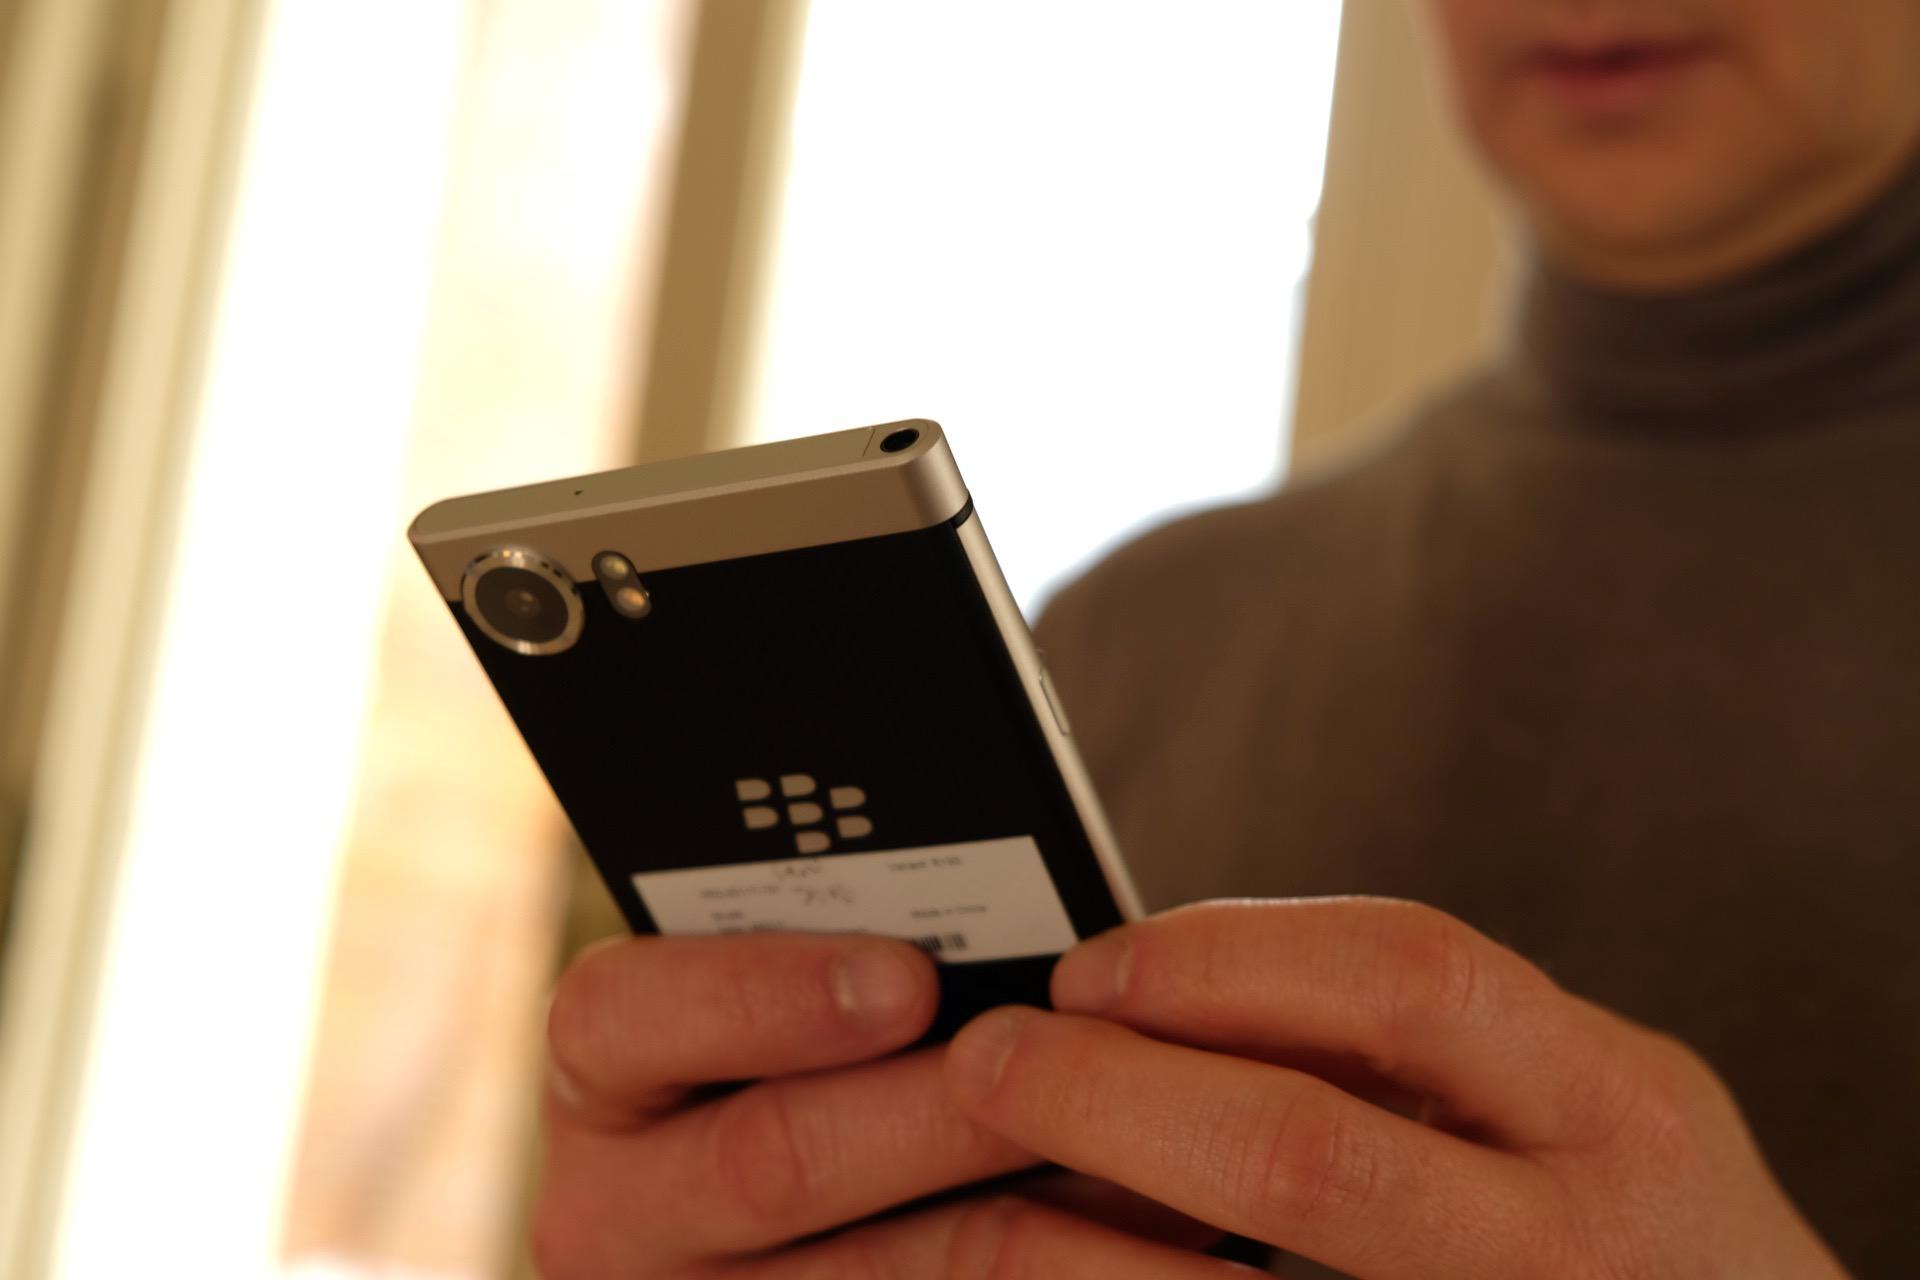 Blackberry Keyone im Hands on: Android-Smartphone mit toller Hardware-Tastatur - Blackberry Key One (Foto: Michael Wieczorek/Golem.de)